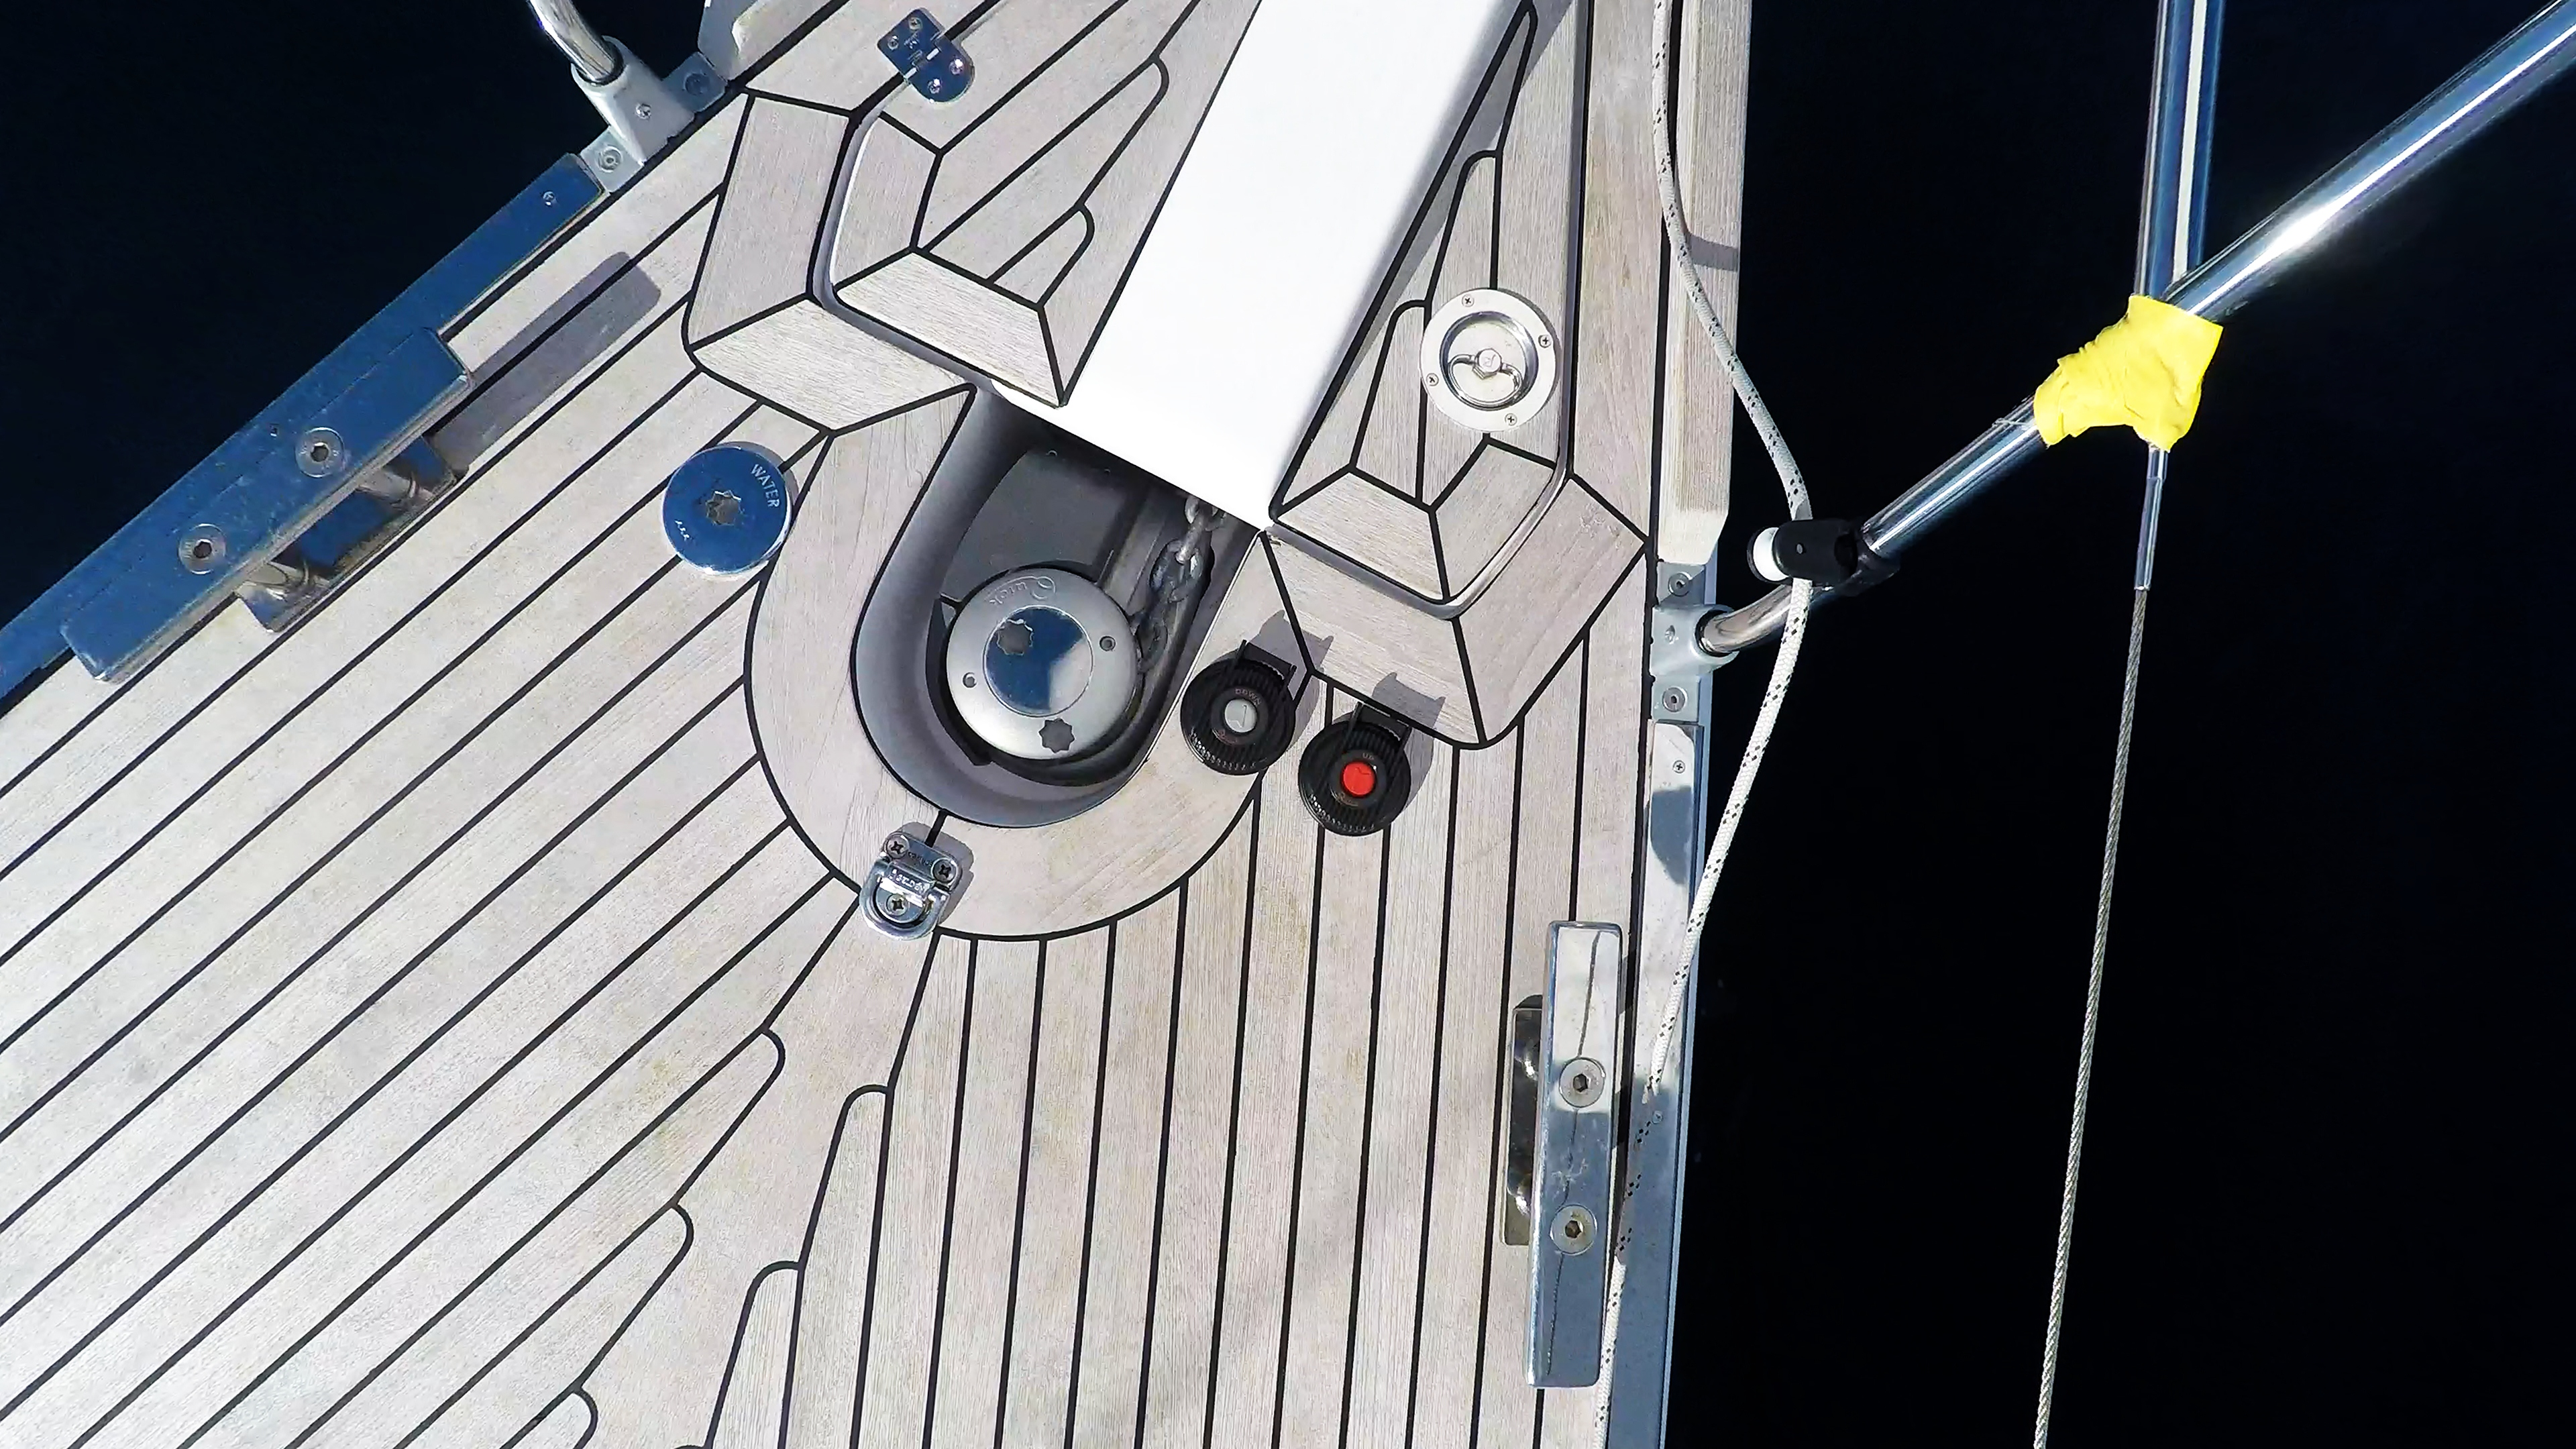 barcha a vela salpa ancora elettrico pontein teak prua della barca a vela